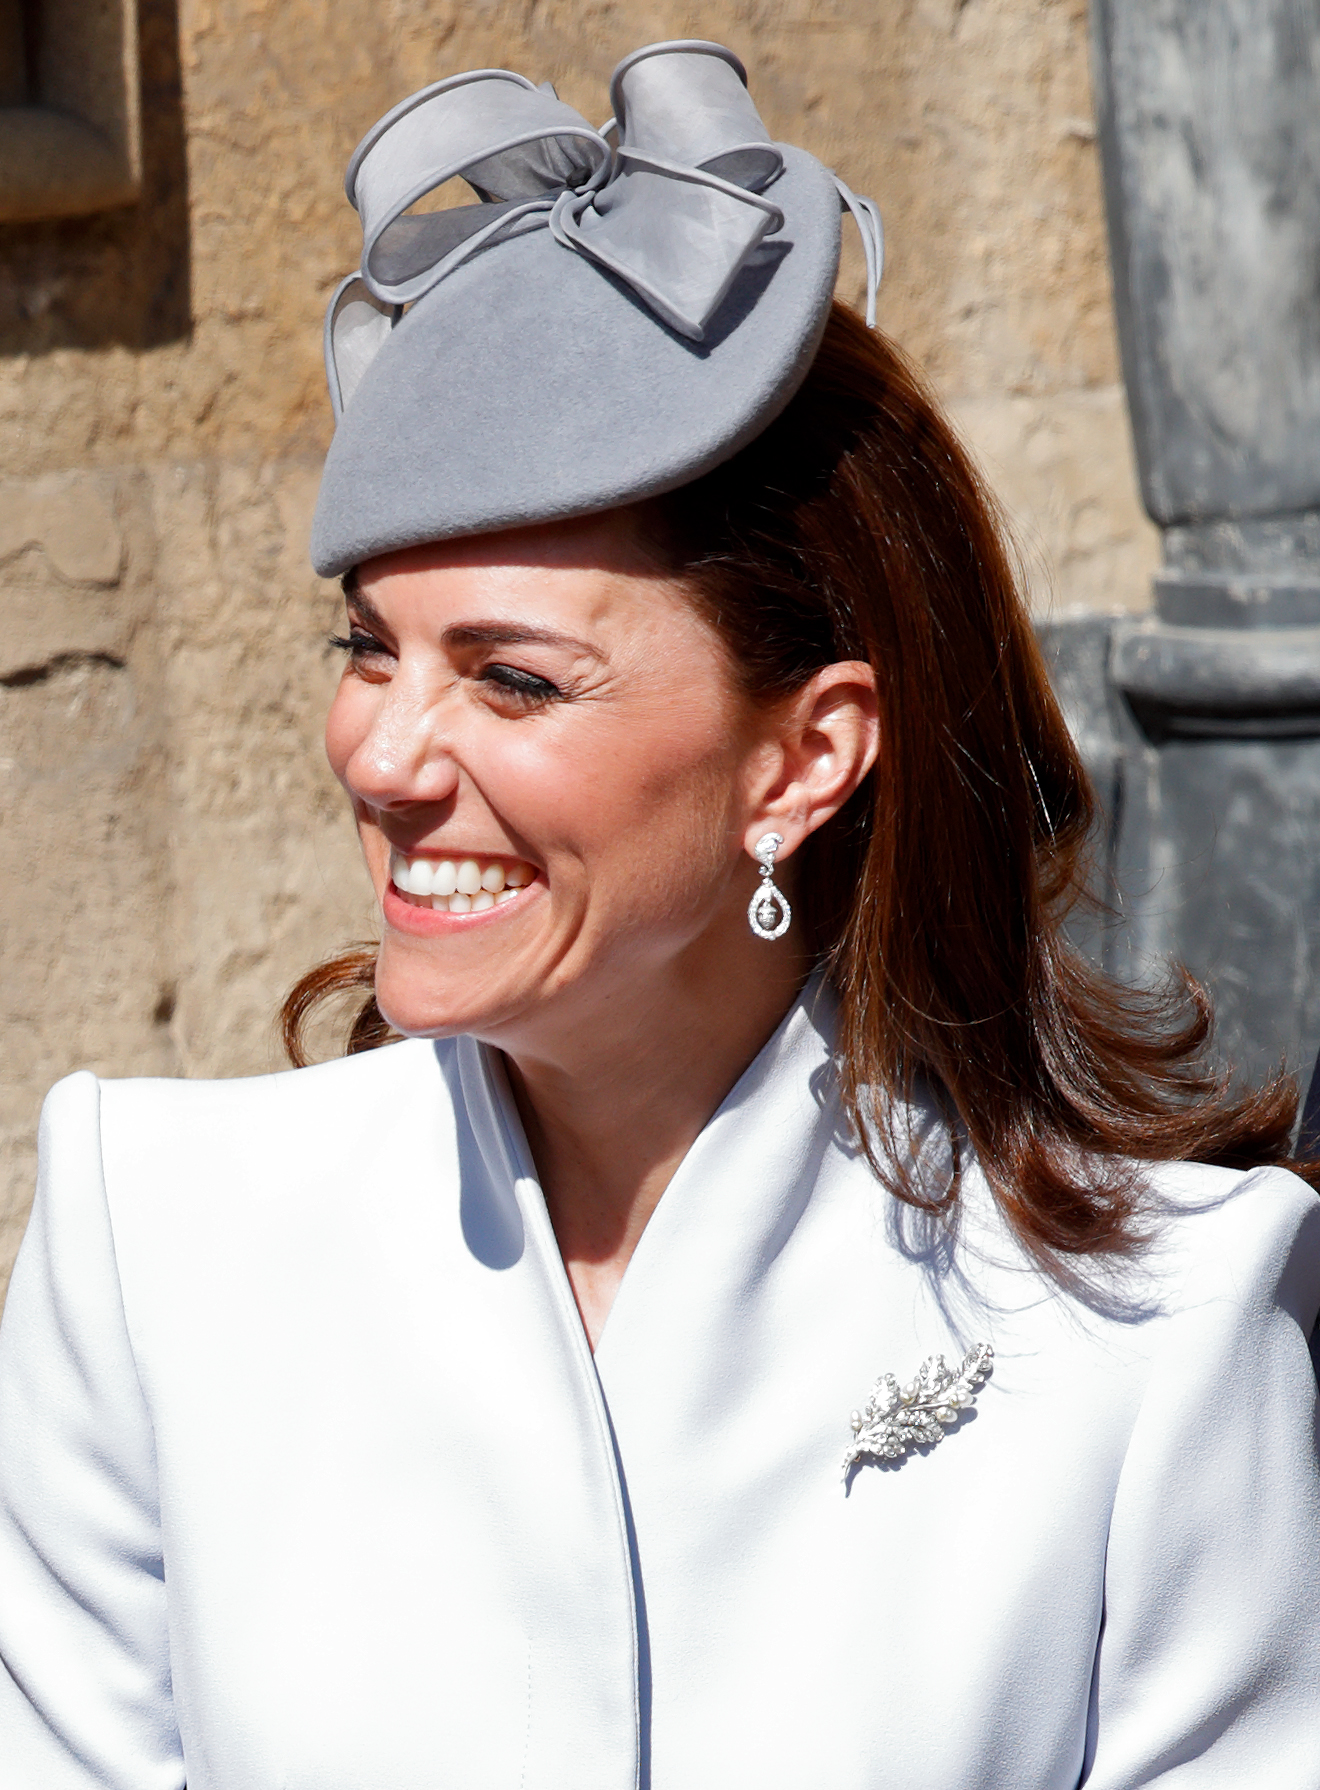 kate middleton wearing her wedding earrings